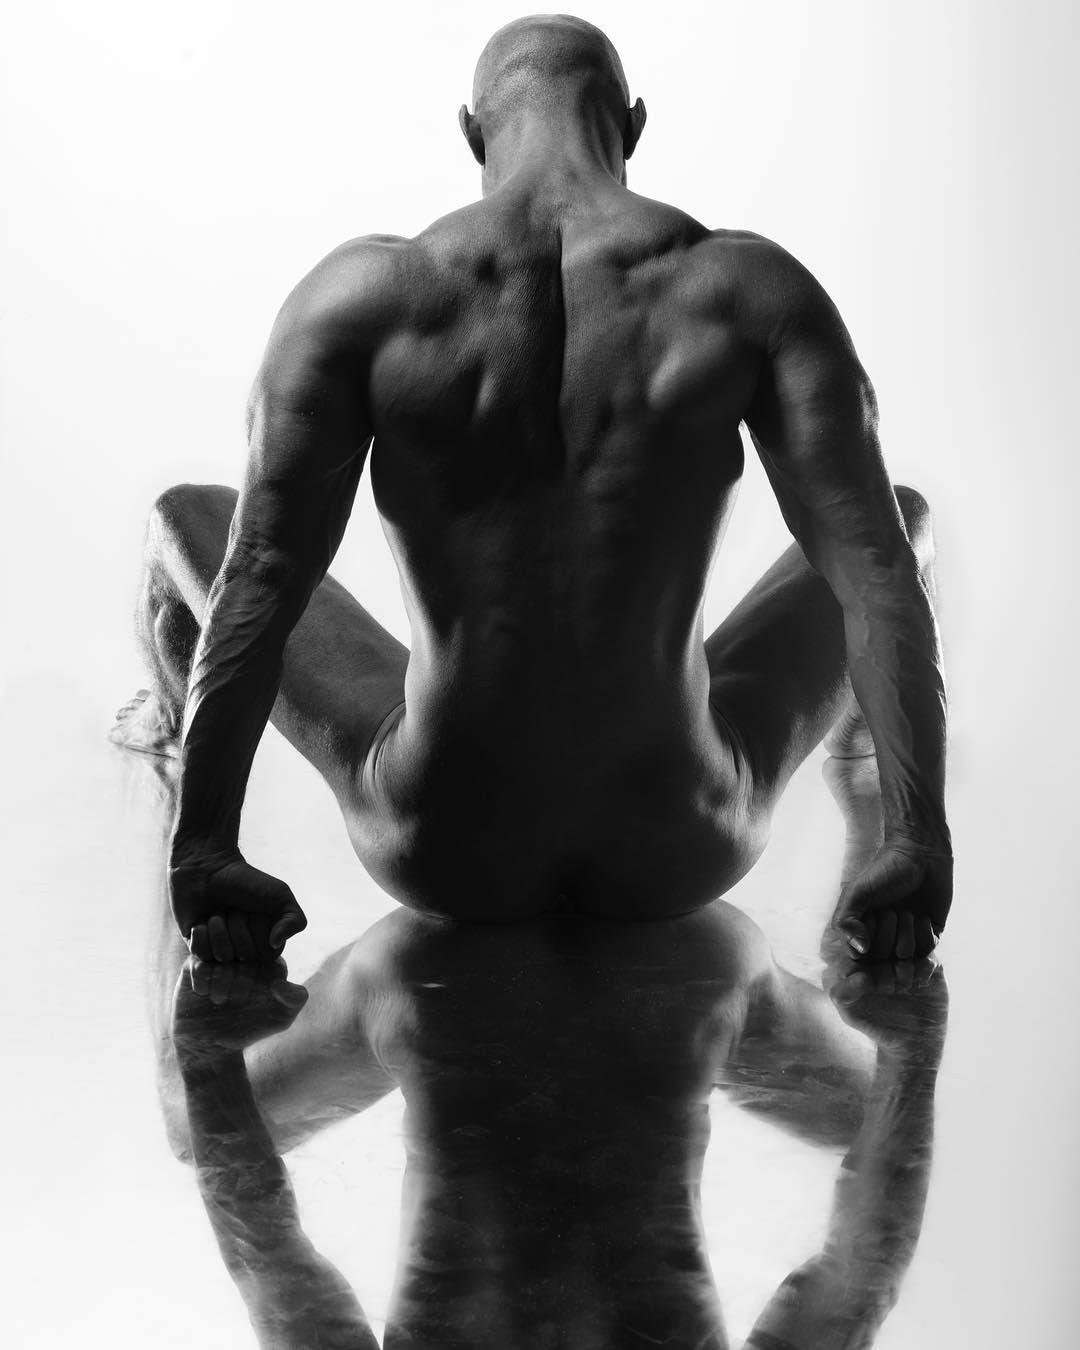 NudE RefleX, by Ivan Lerez ft Maik Cabello (NSFW).